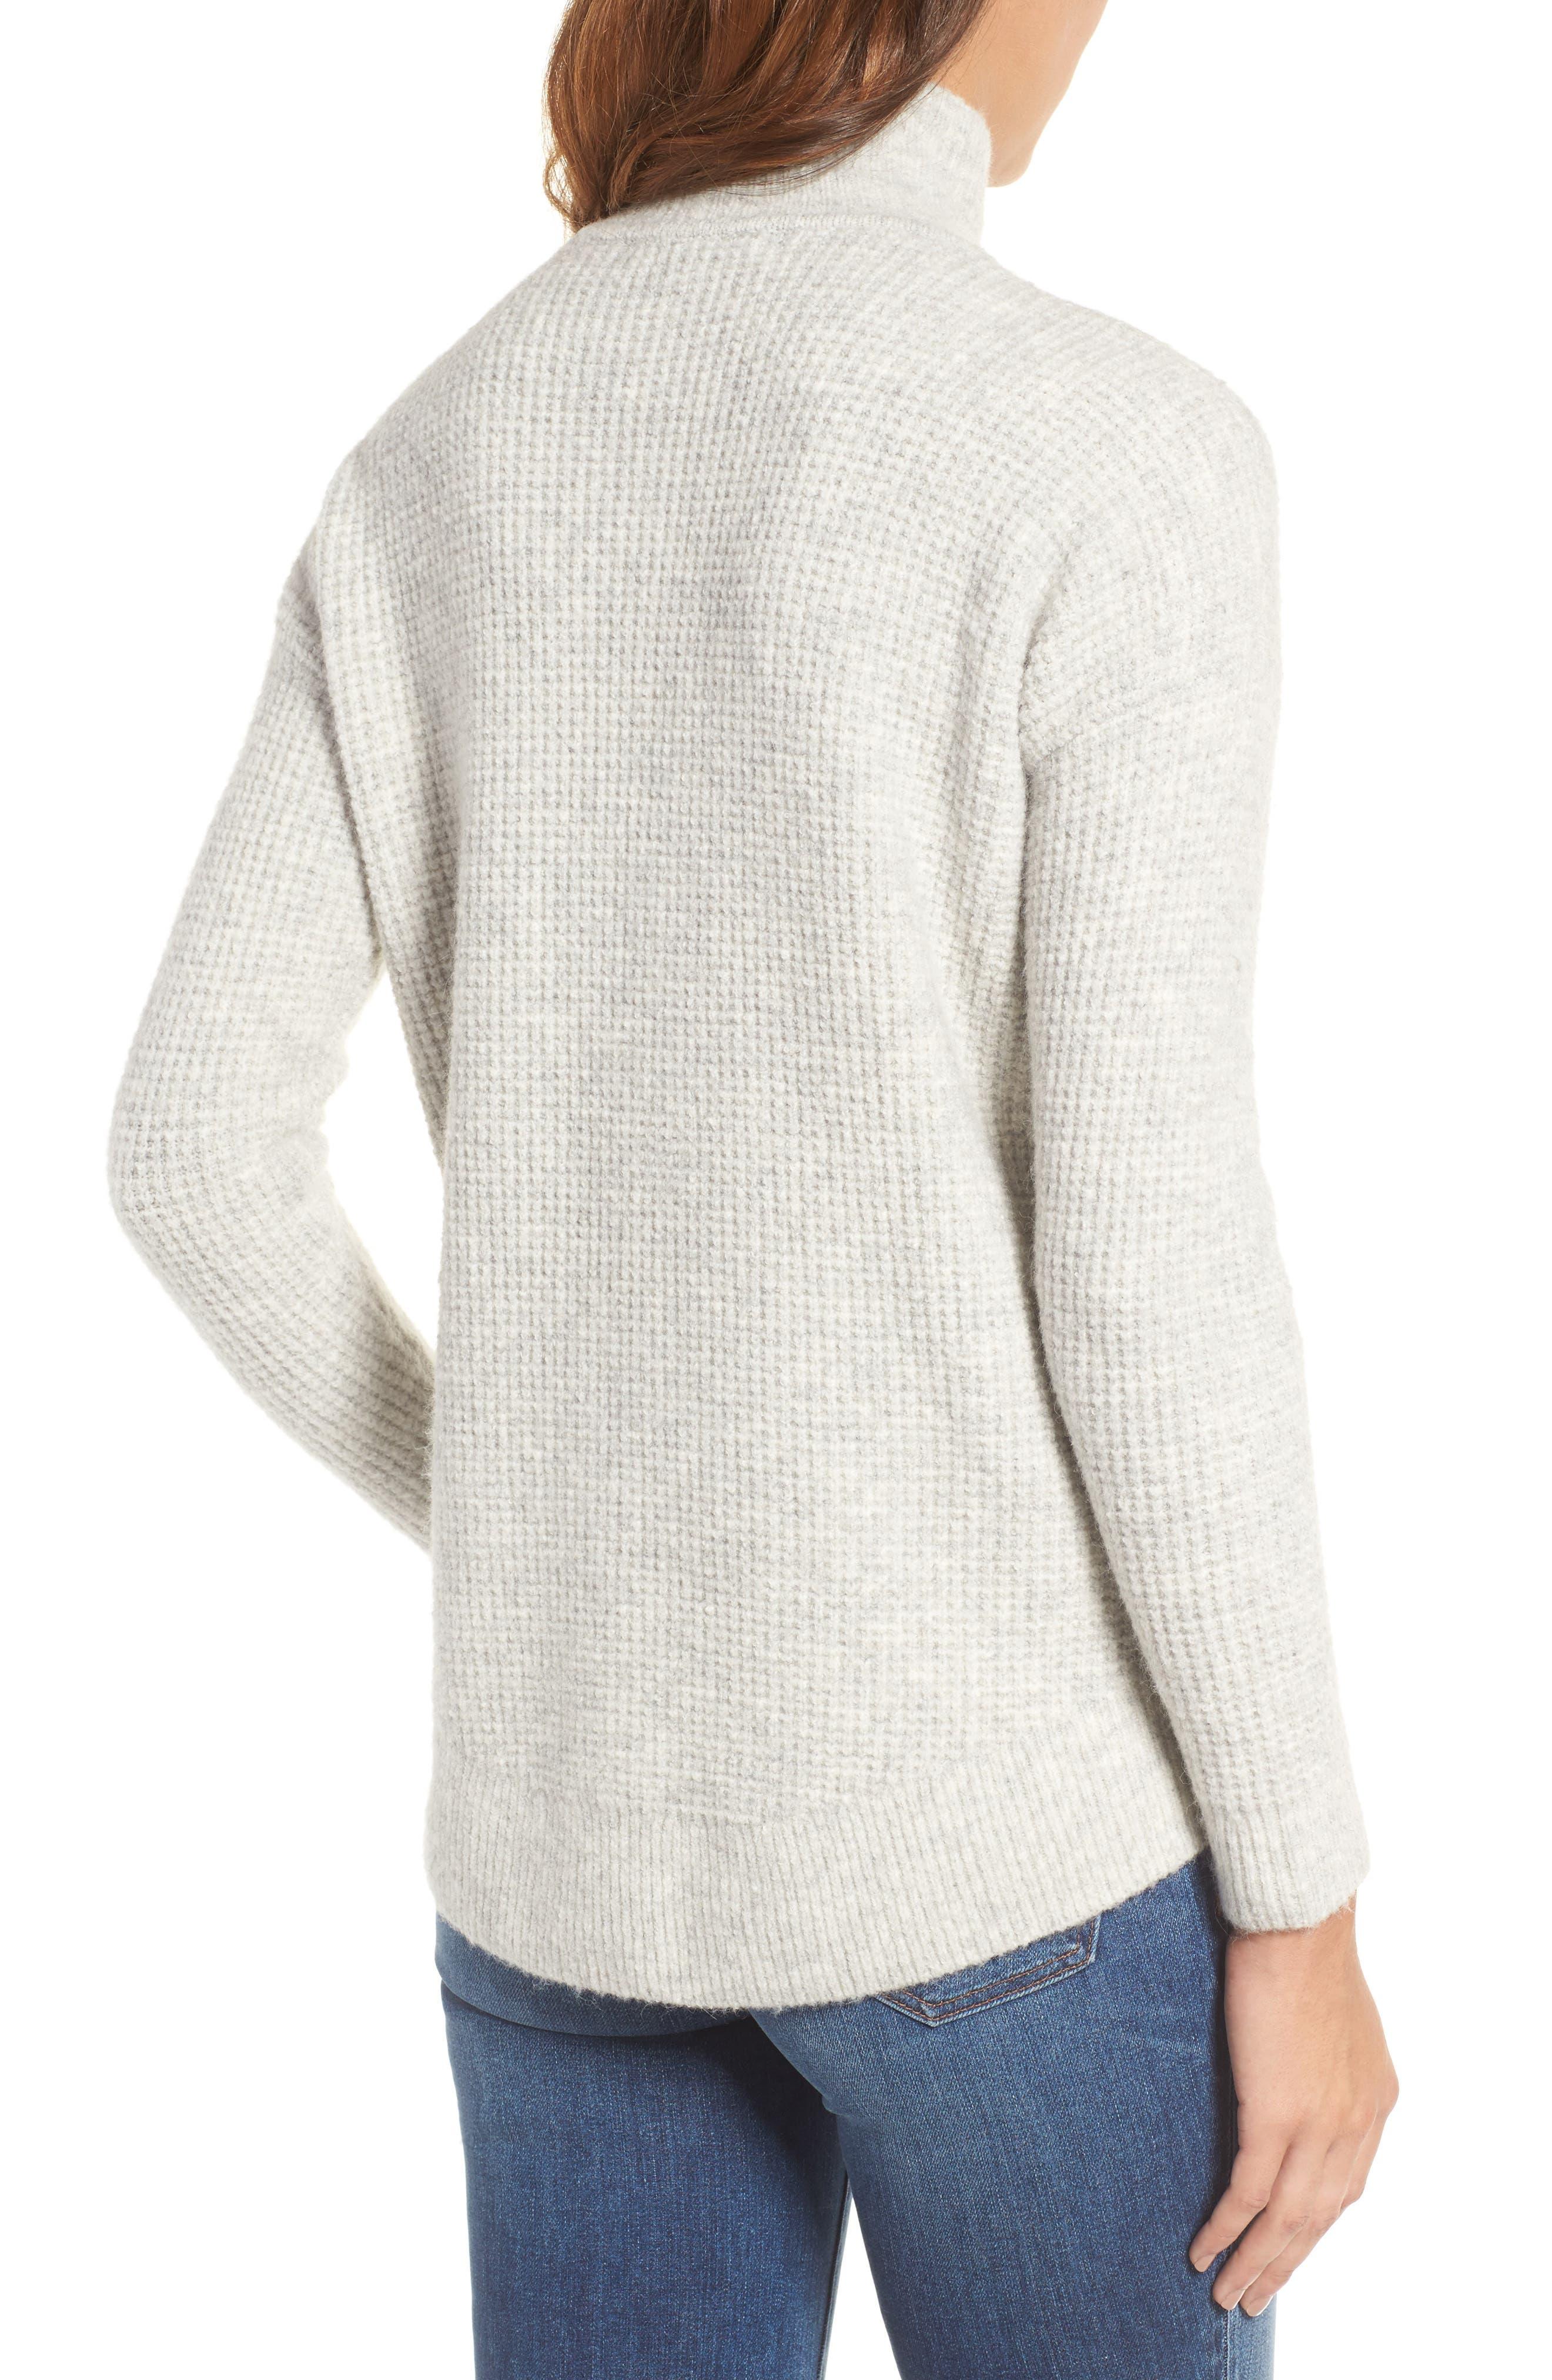 Alternate Image 2  - Madewell Wafflestitch Turtleneck Sweater